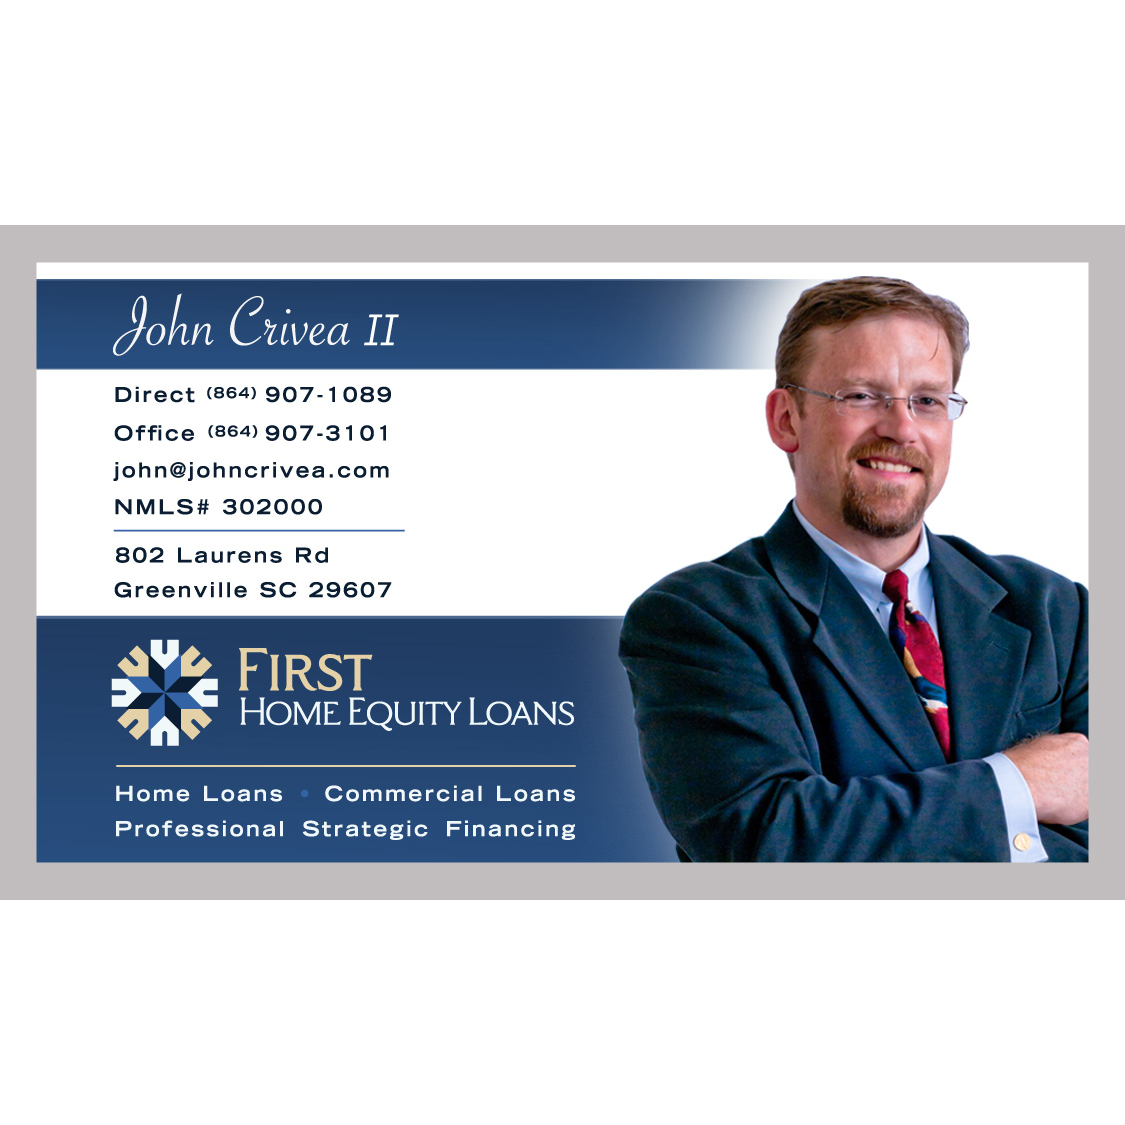 John crivea ii first home equity loan